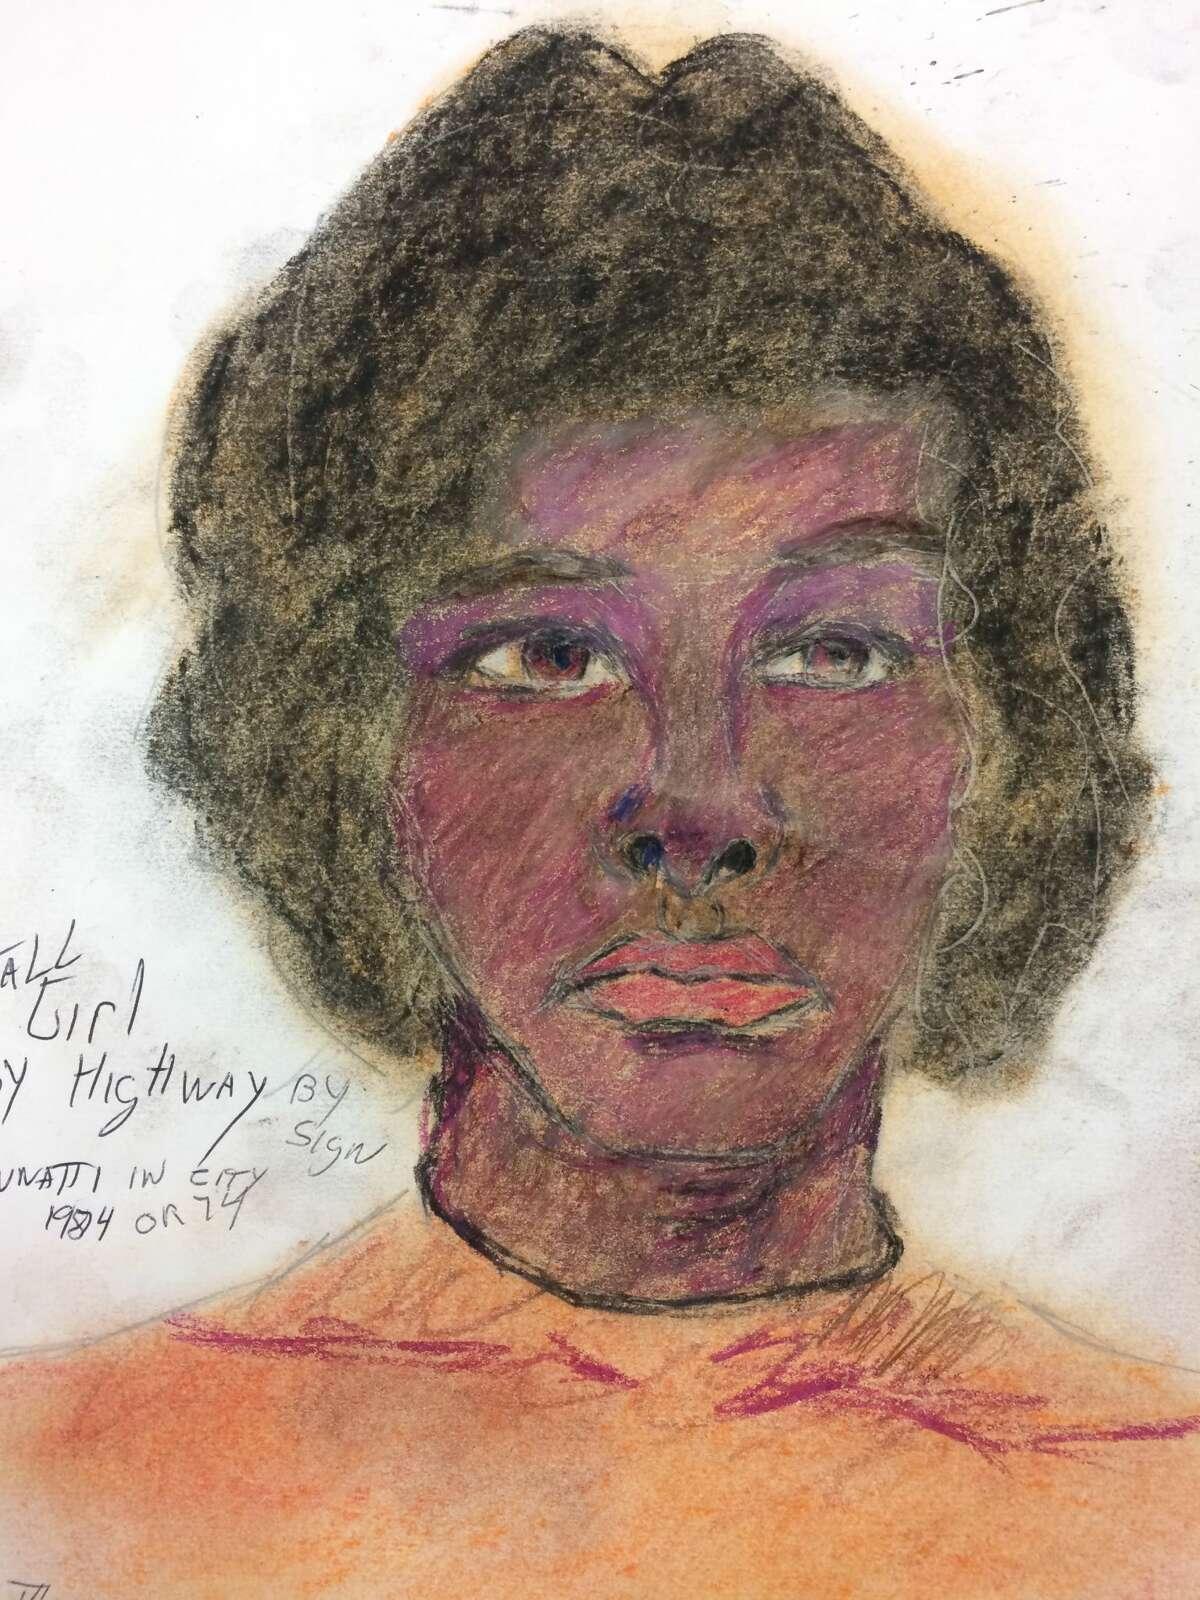 Cincinnati, Ohio Unmatched Confession: Black female killed in 1974.